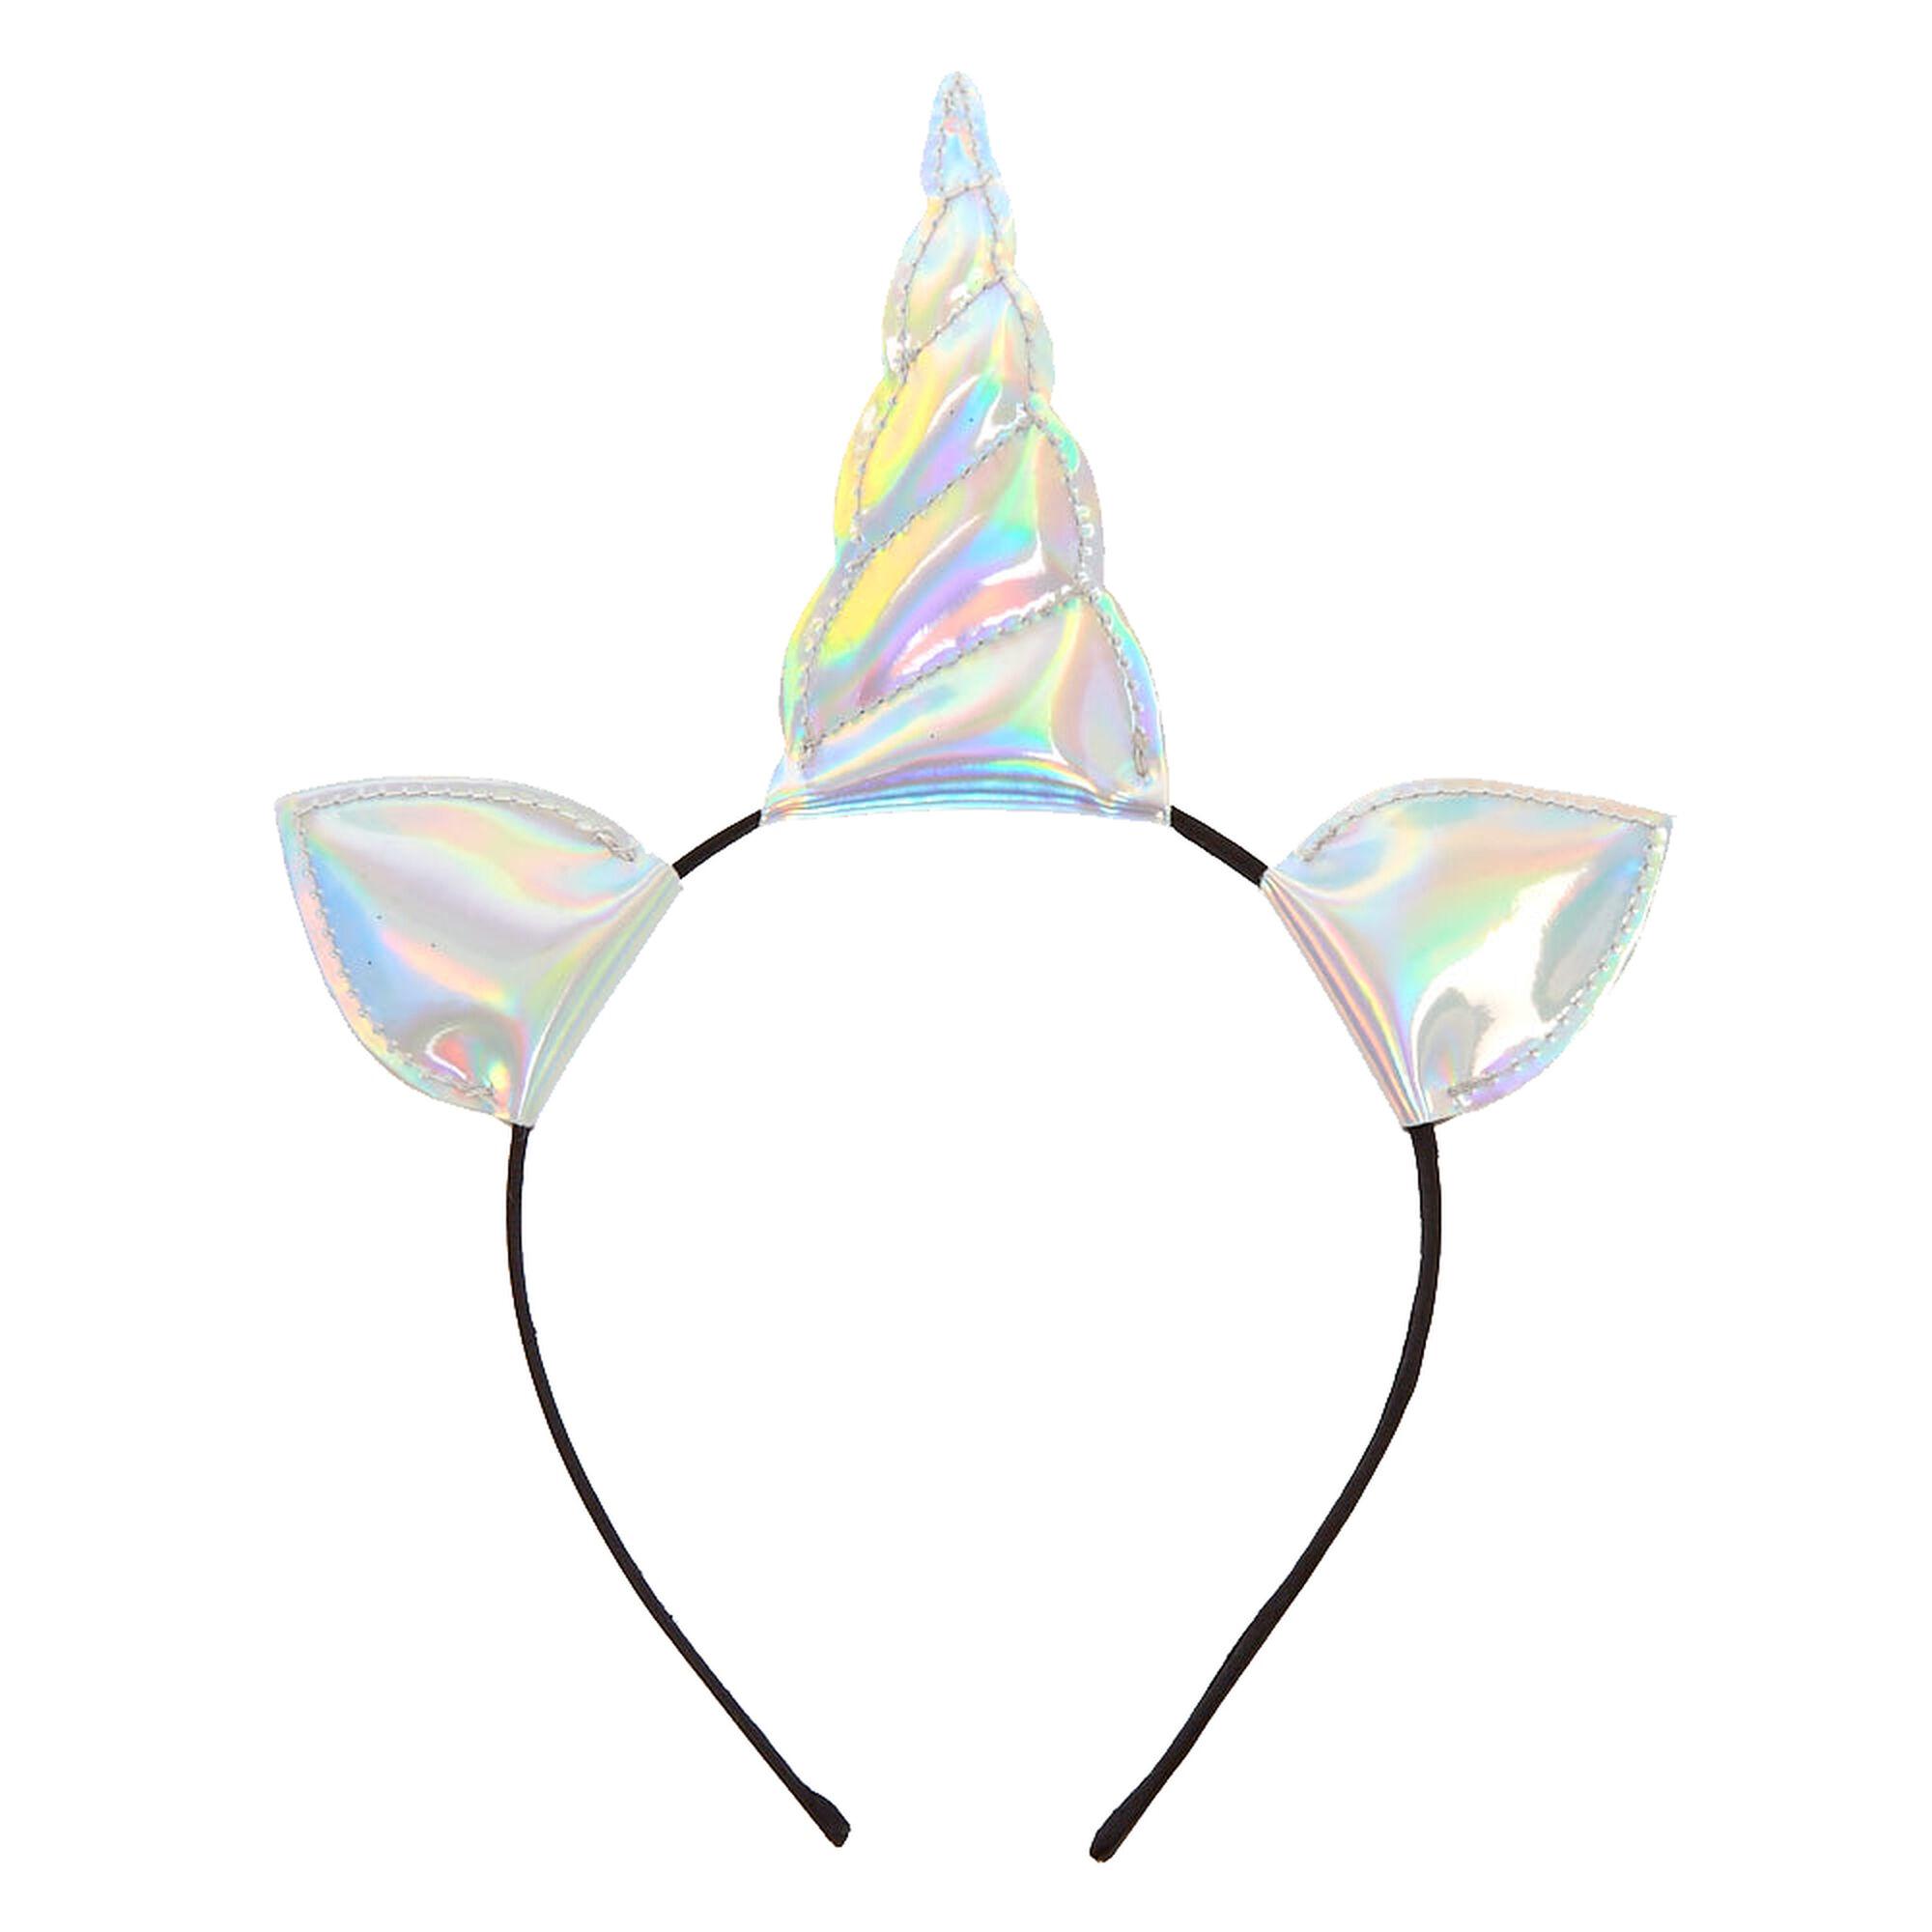 ... Holographic Unicorn Horn Headband b6ce624b2cb